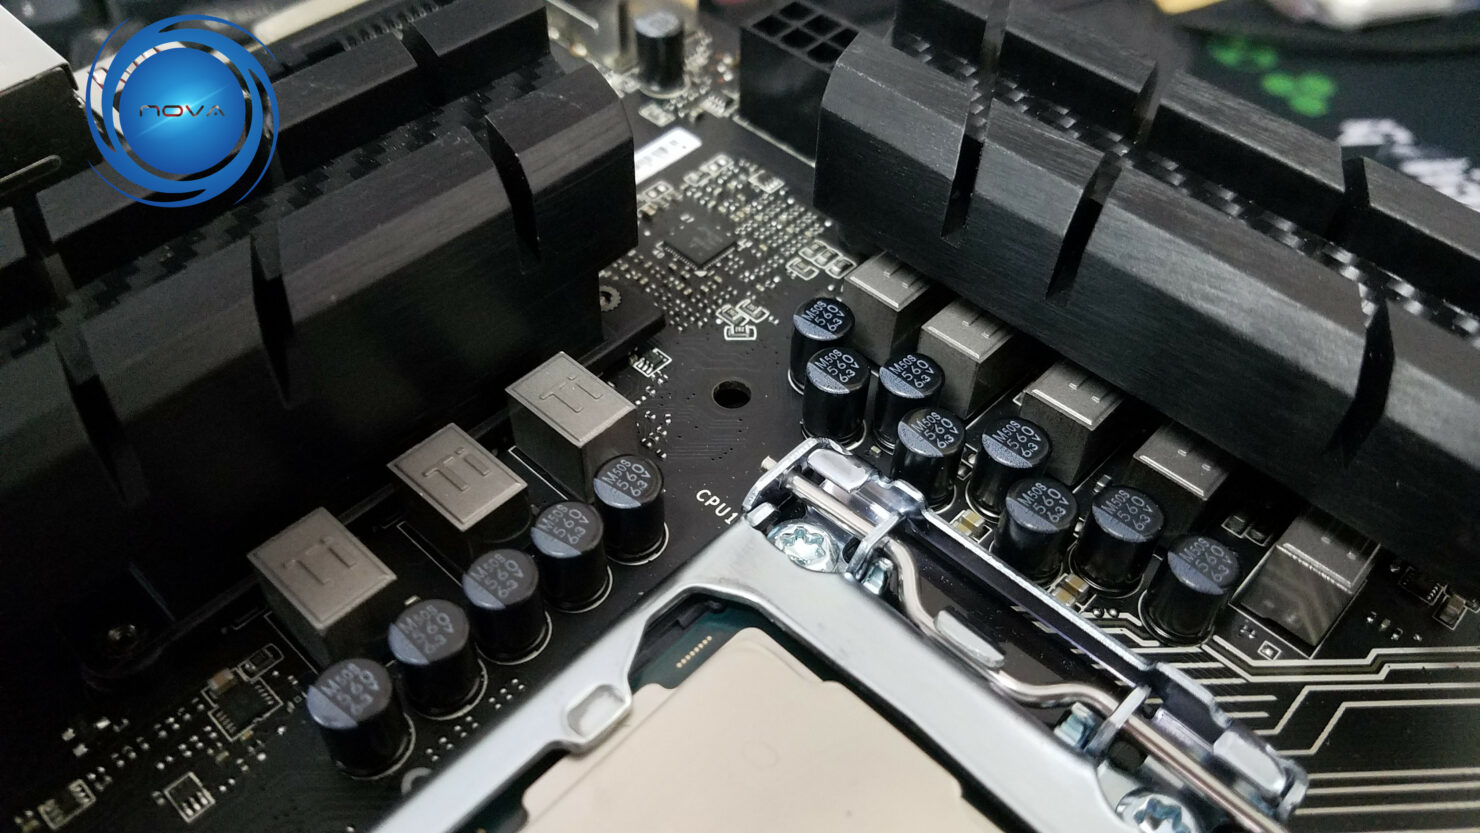 intel-core-i7-7700k-kaby-lake-benchmarks_5